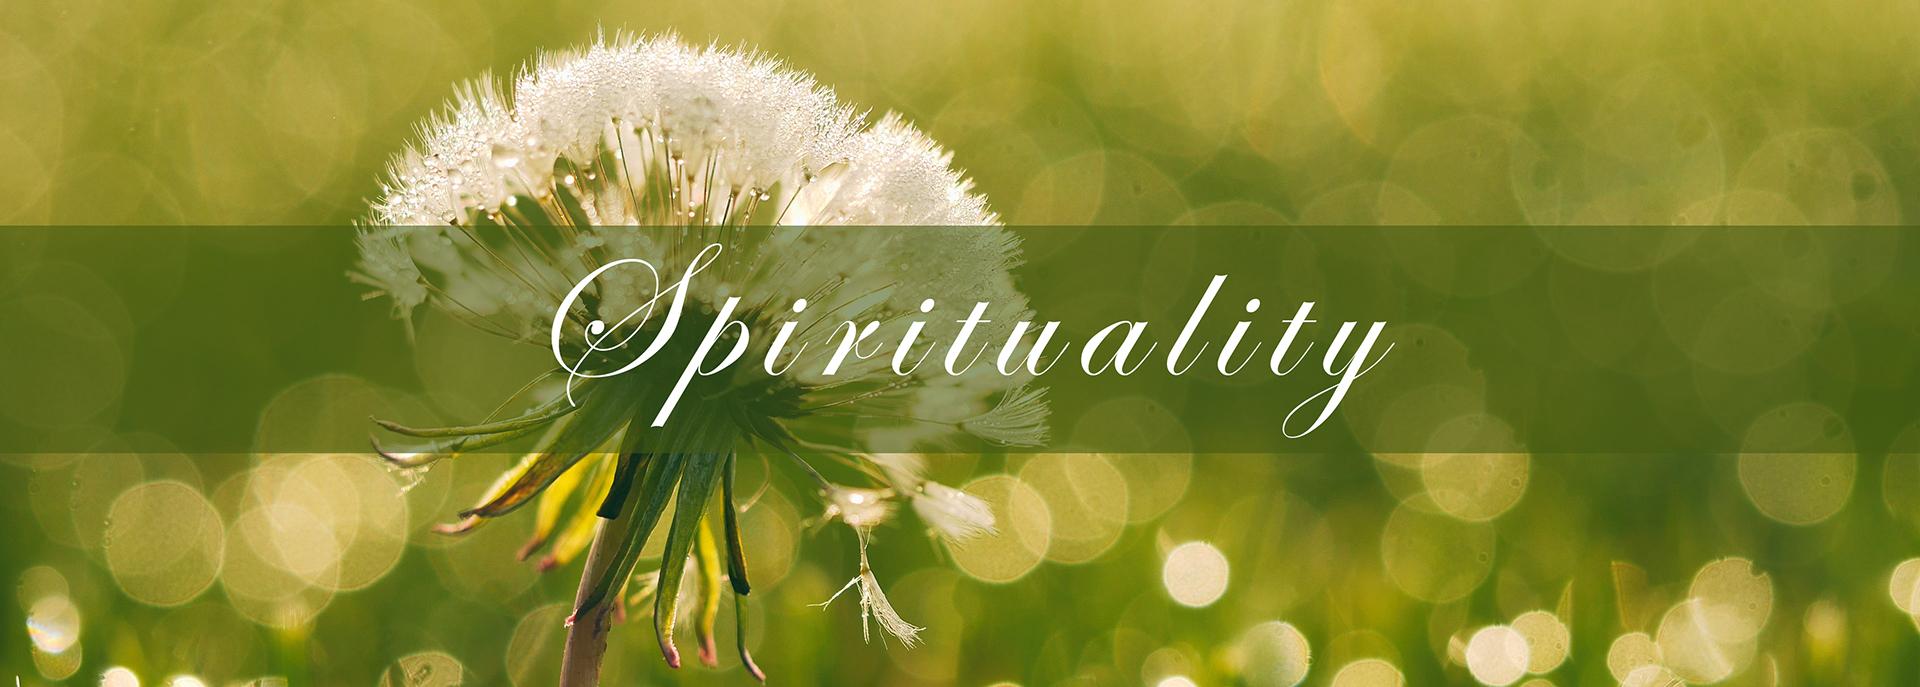 Spirituality counselling